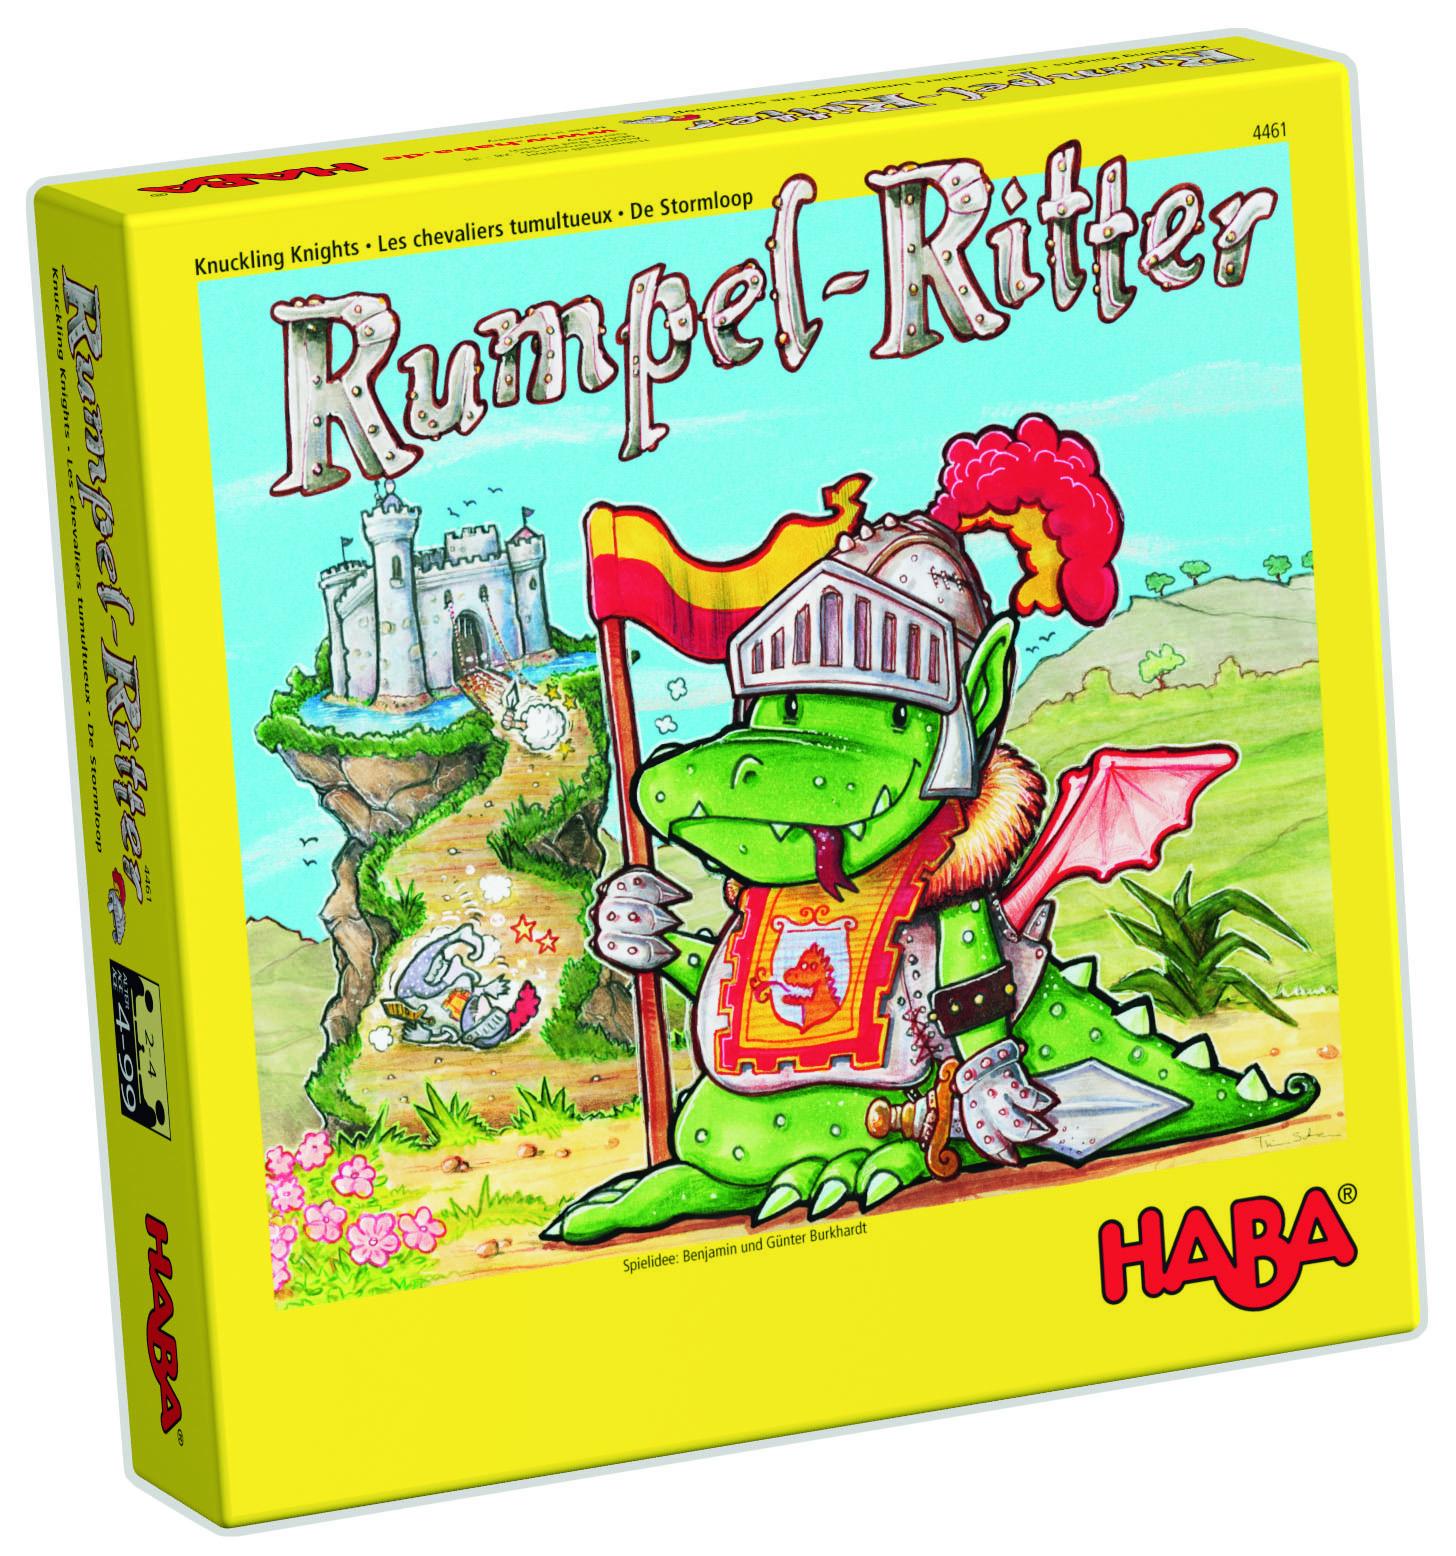 HABA Rumpelritter 335-4461